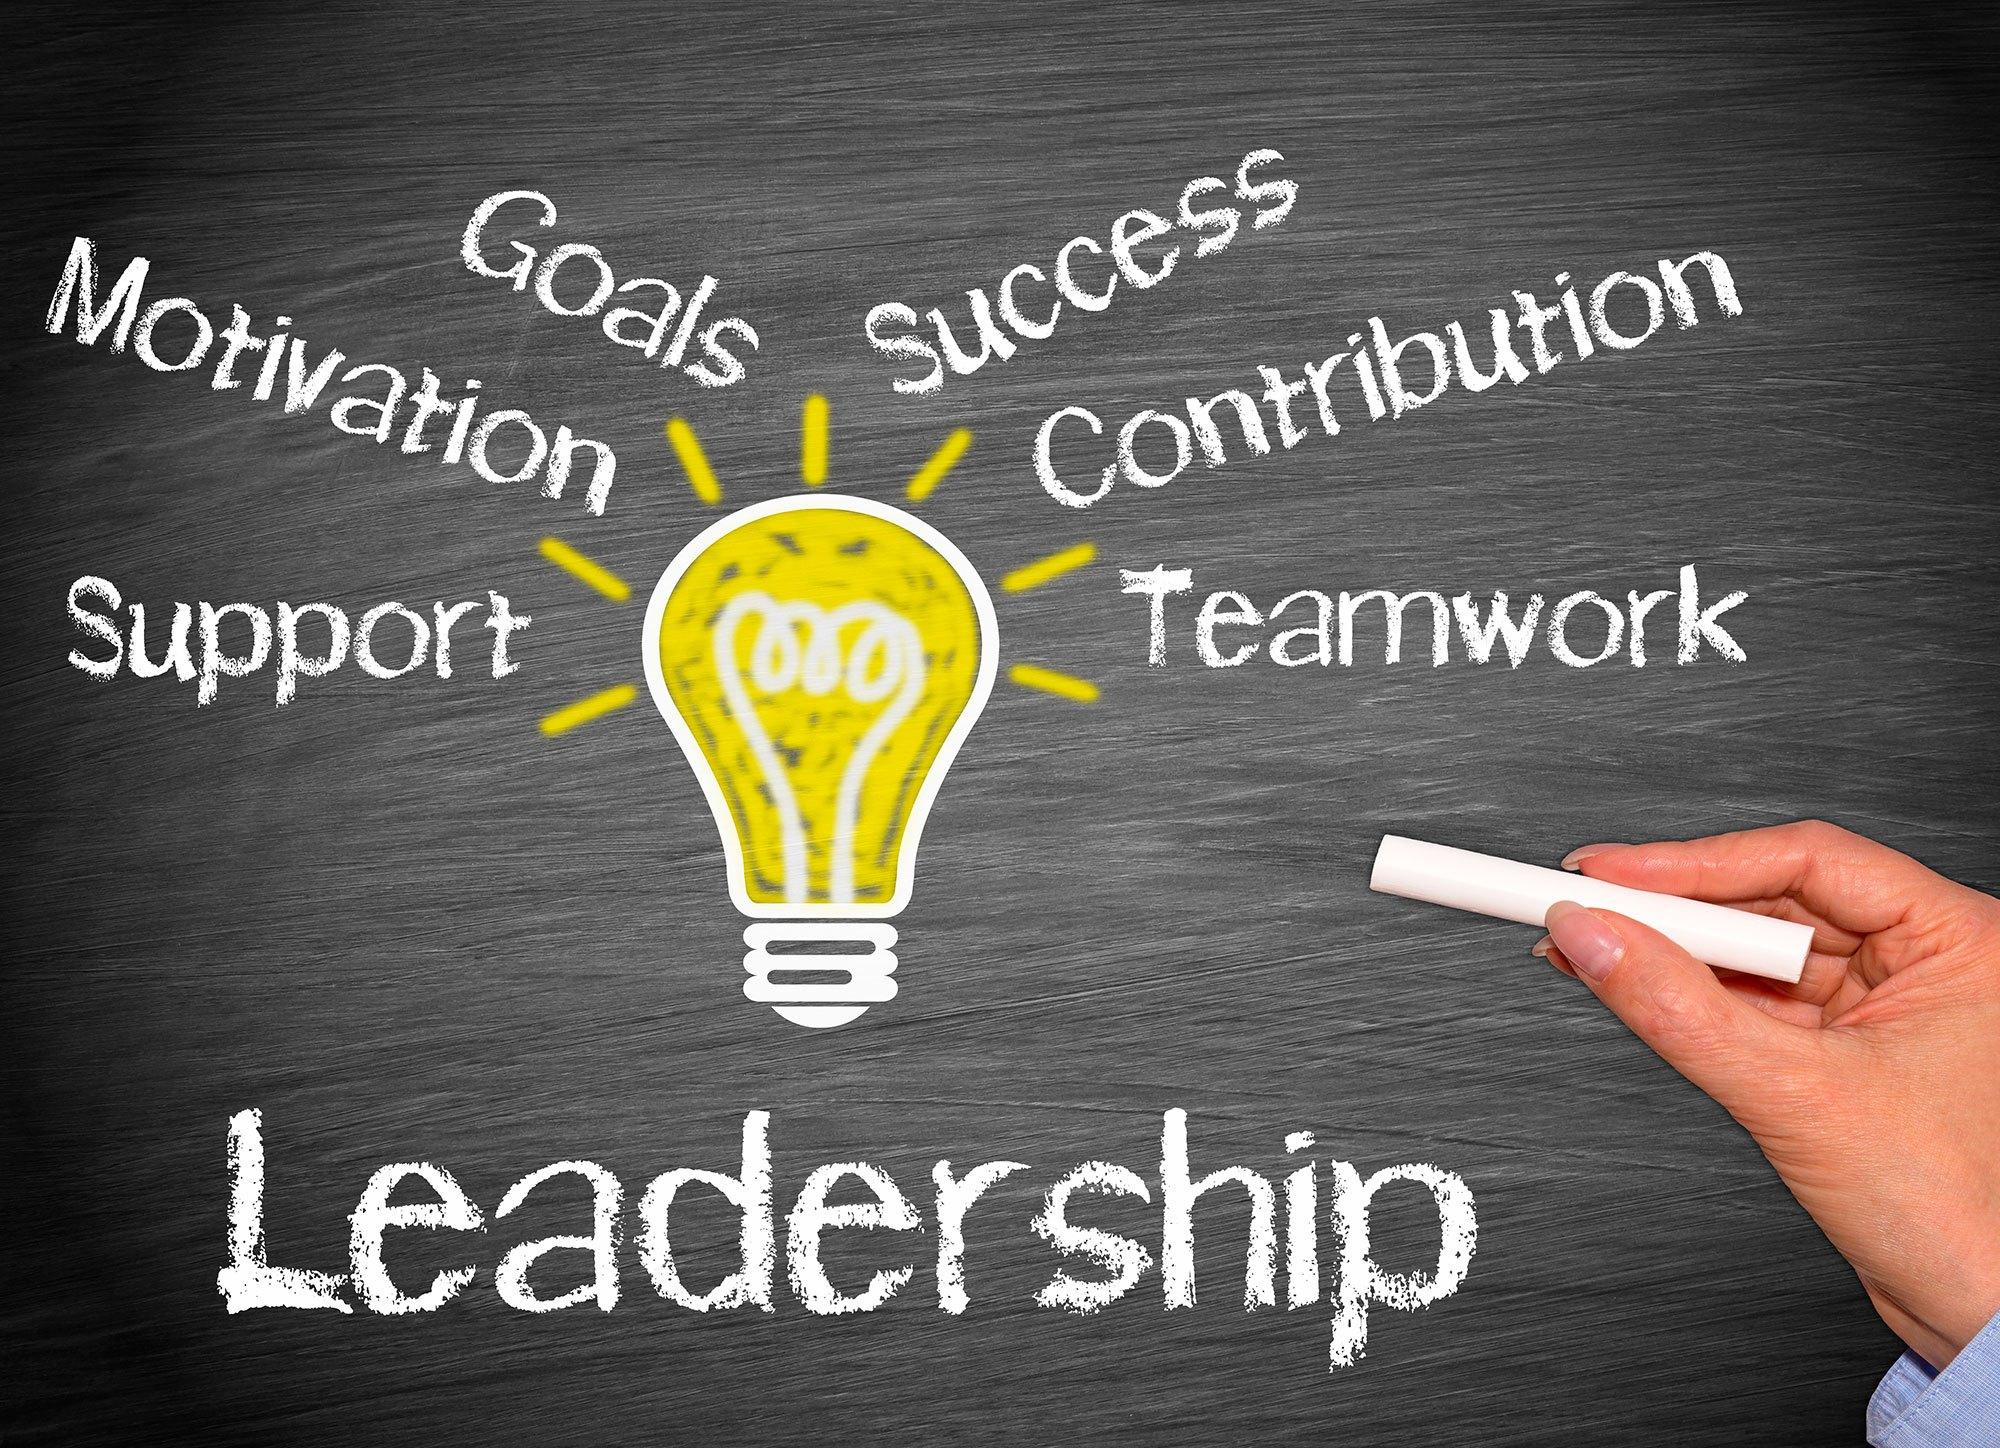 leadership training games, games for leadership training